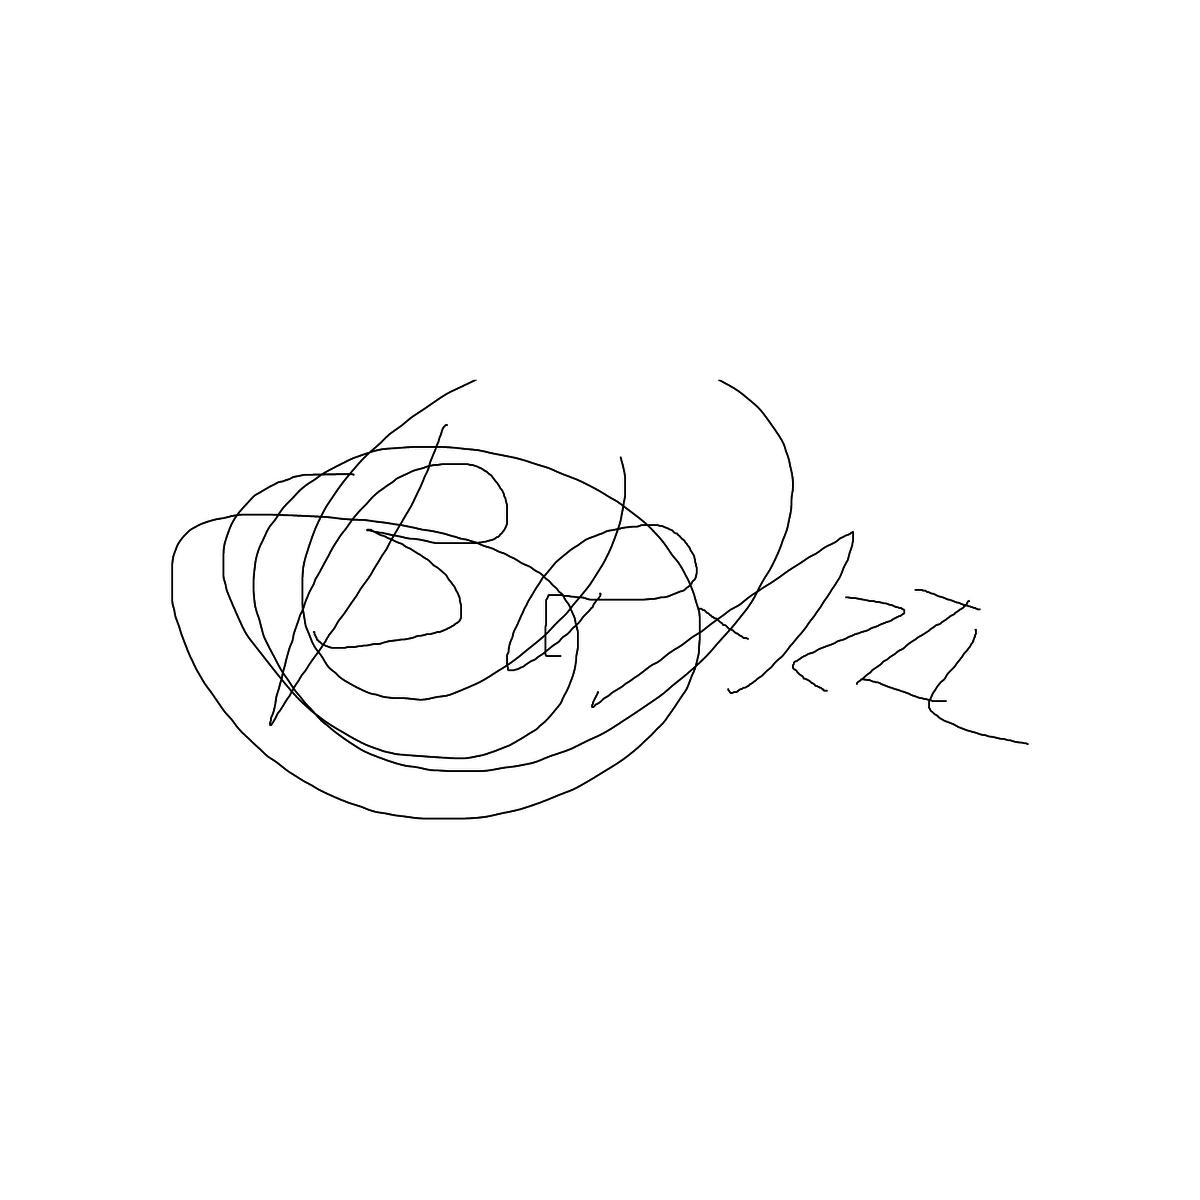 BAAAM drawing#3359 lat:-12.6403379440307620lng: -52.6464843750000000